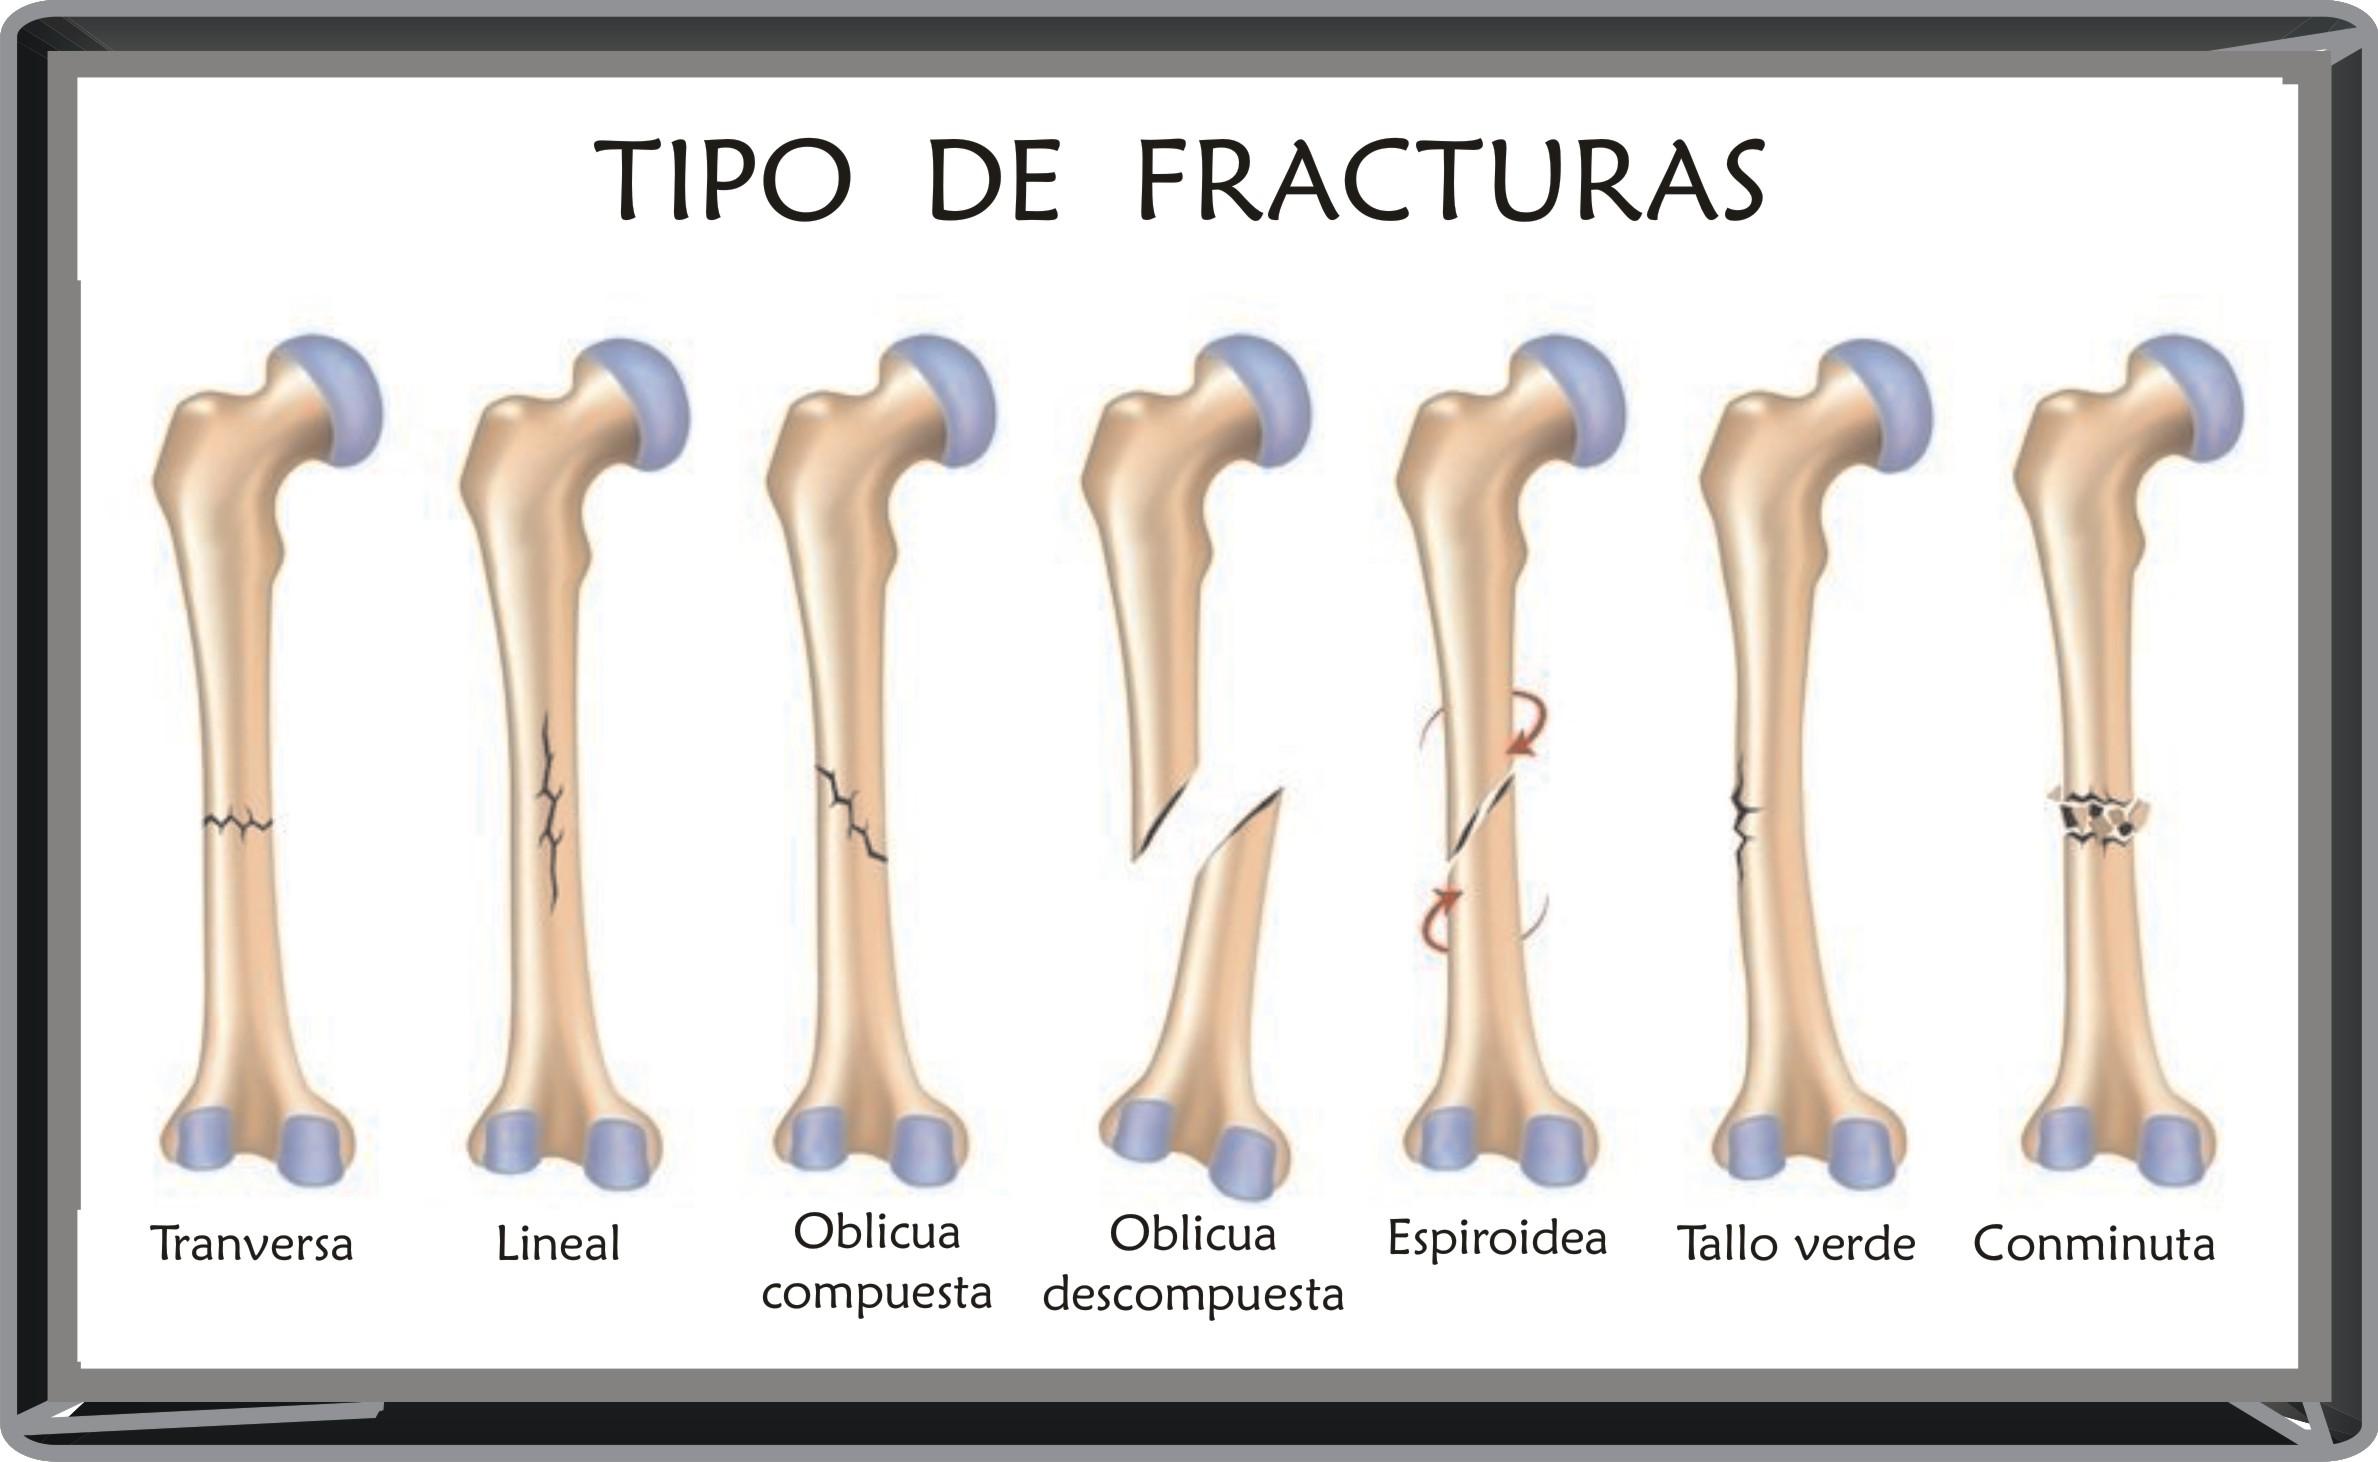 FISIOTERAPIA TRAUMATOLOGICA CORUA FRACTURAS WEBjpg